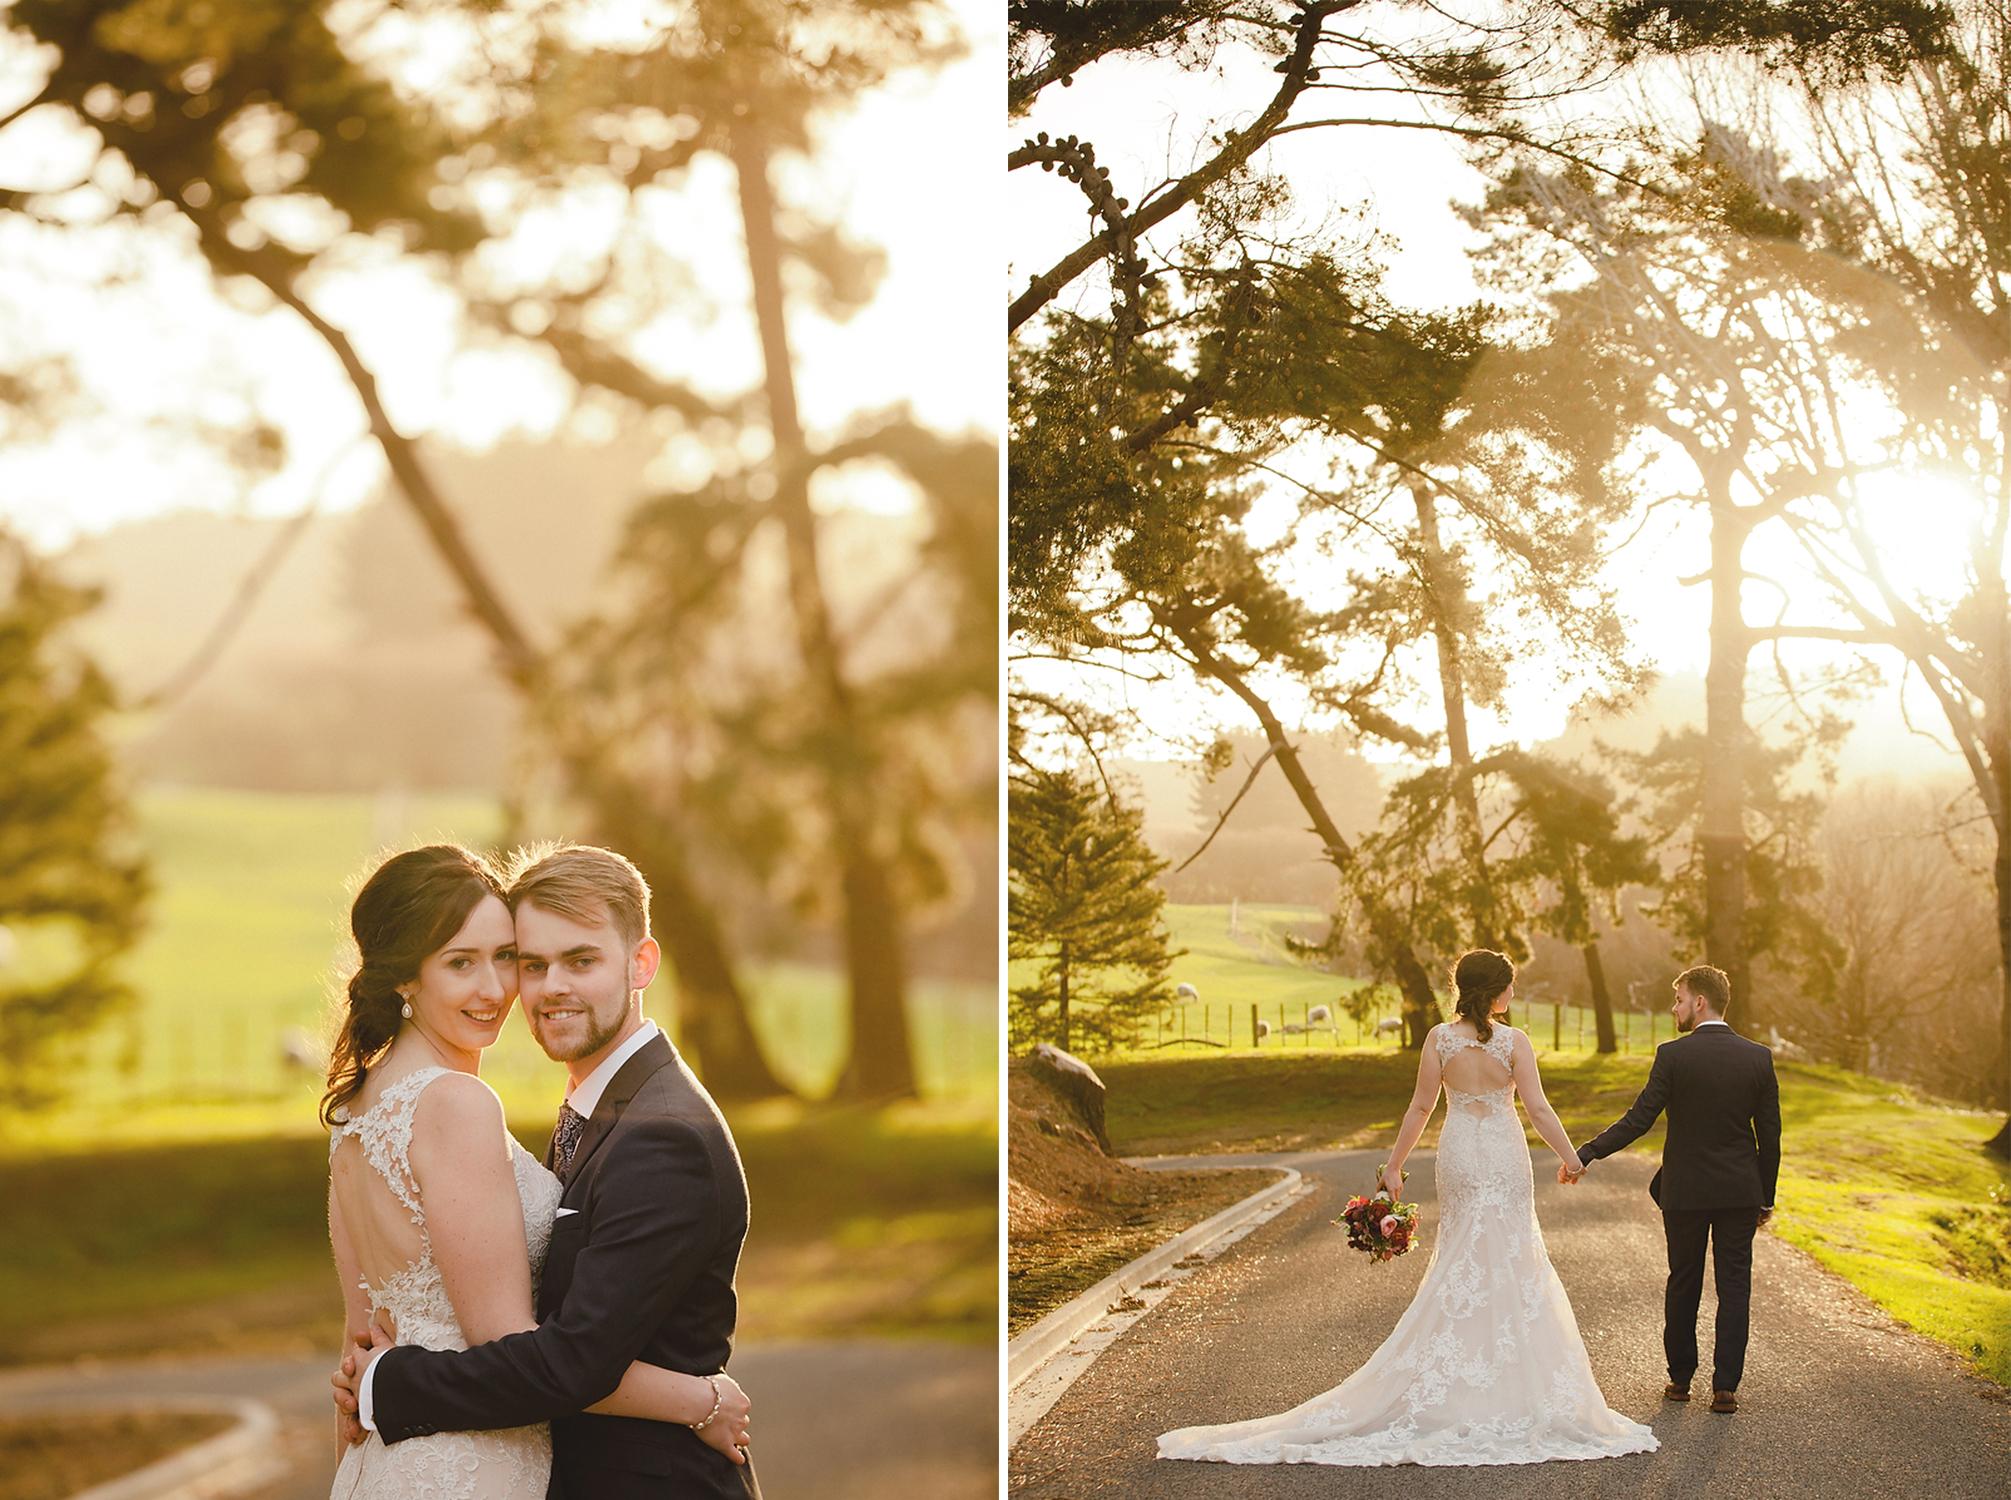 wellington wedding photography NZ - 0177.JPG